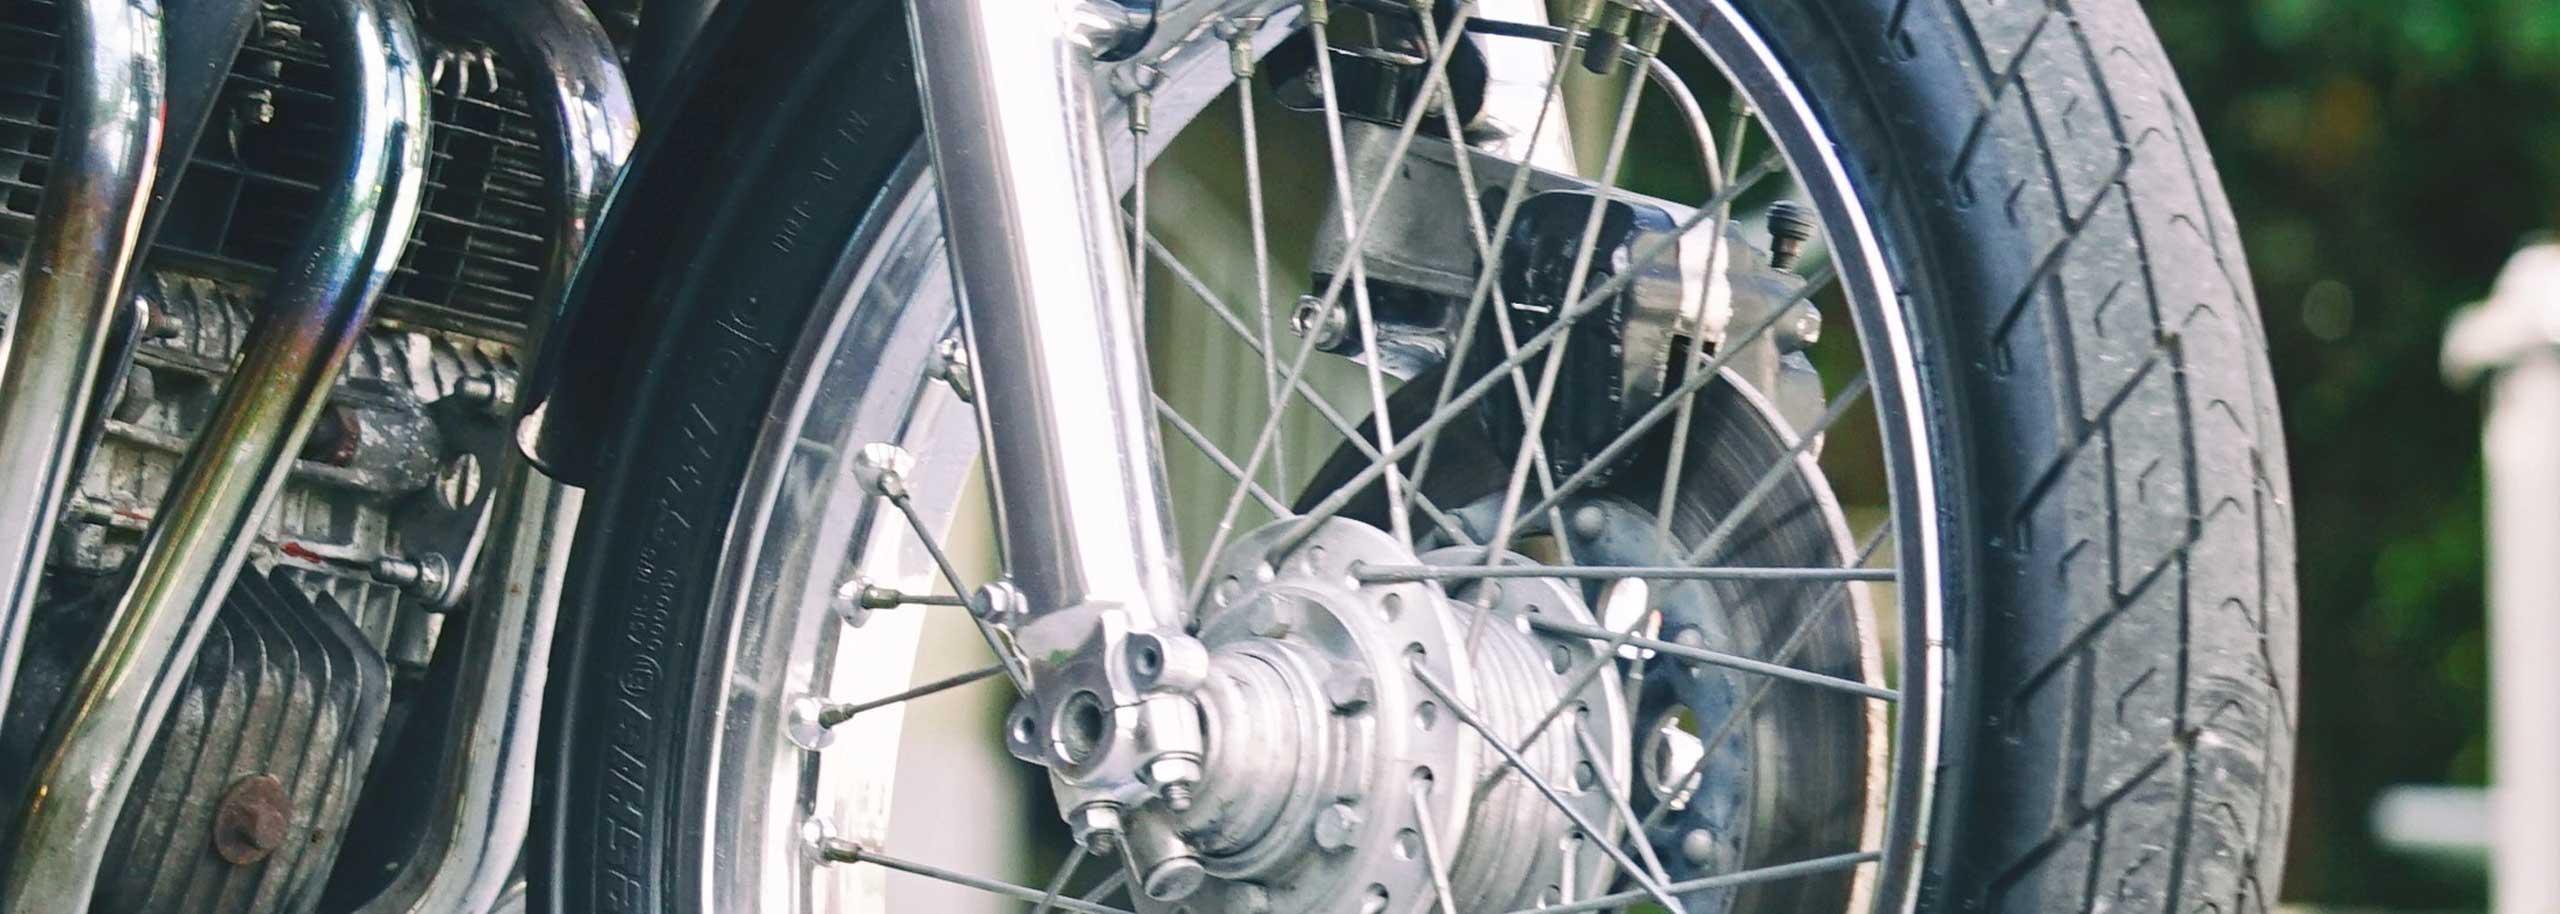 04_TITAN-SAKURA_Honda-CB500-Four_Cafe-Racer-Graz-Motorrad-Umbau-Austria-Vintage_Custom-Bikes_Zweirad_Vierzylinder_Auspuff-Heck-Sattel-Classic